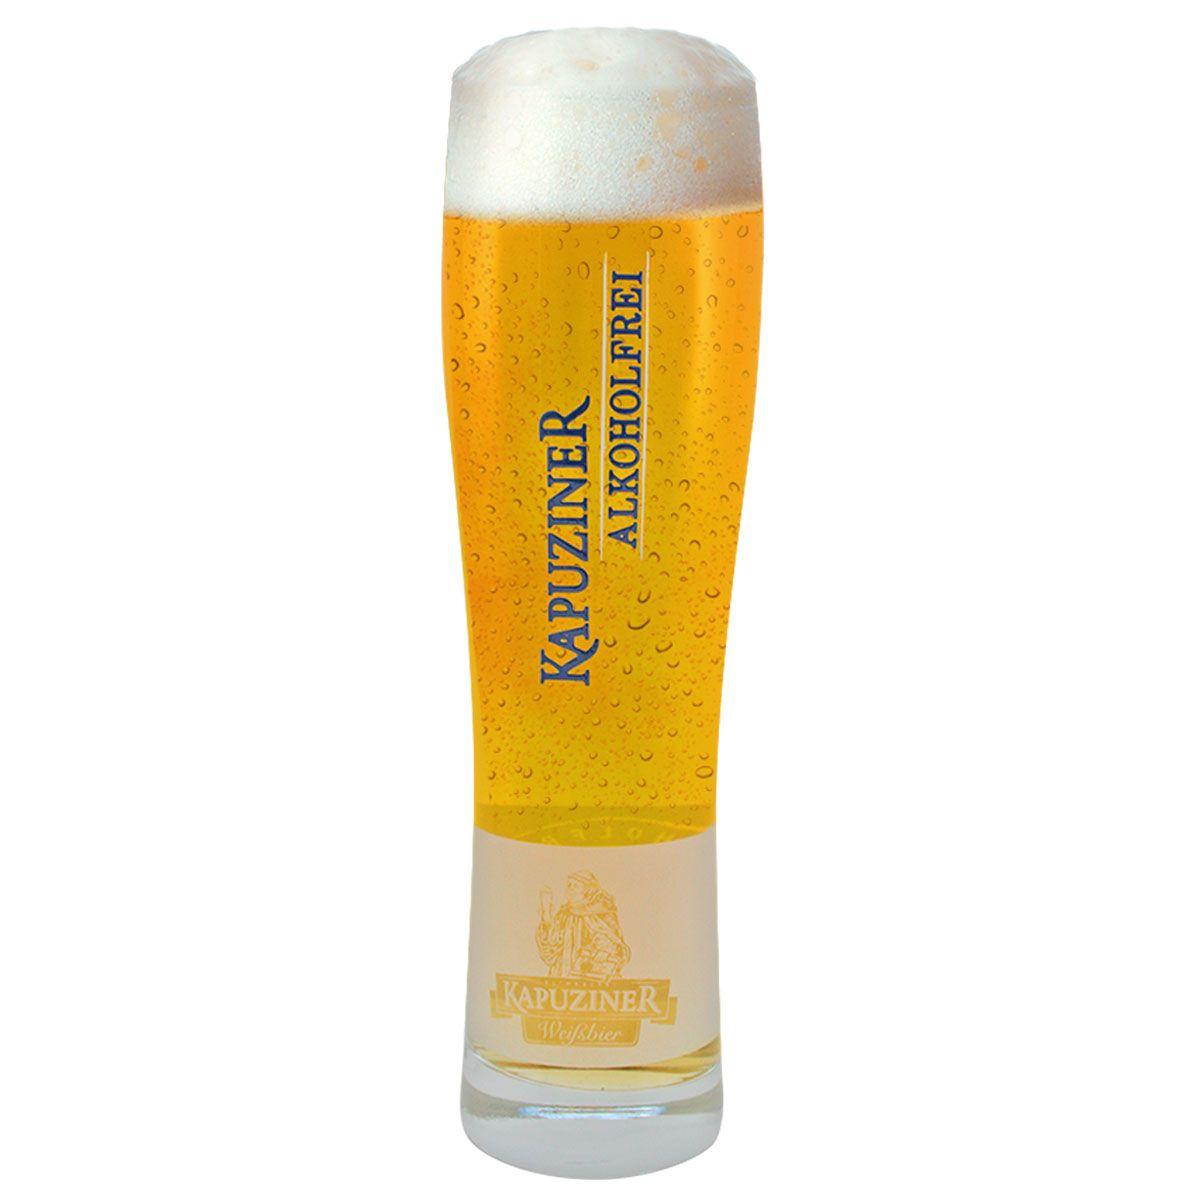 Copo de Cerveja Kapuziner Alkoholfrei 640ml